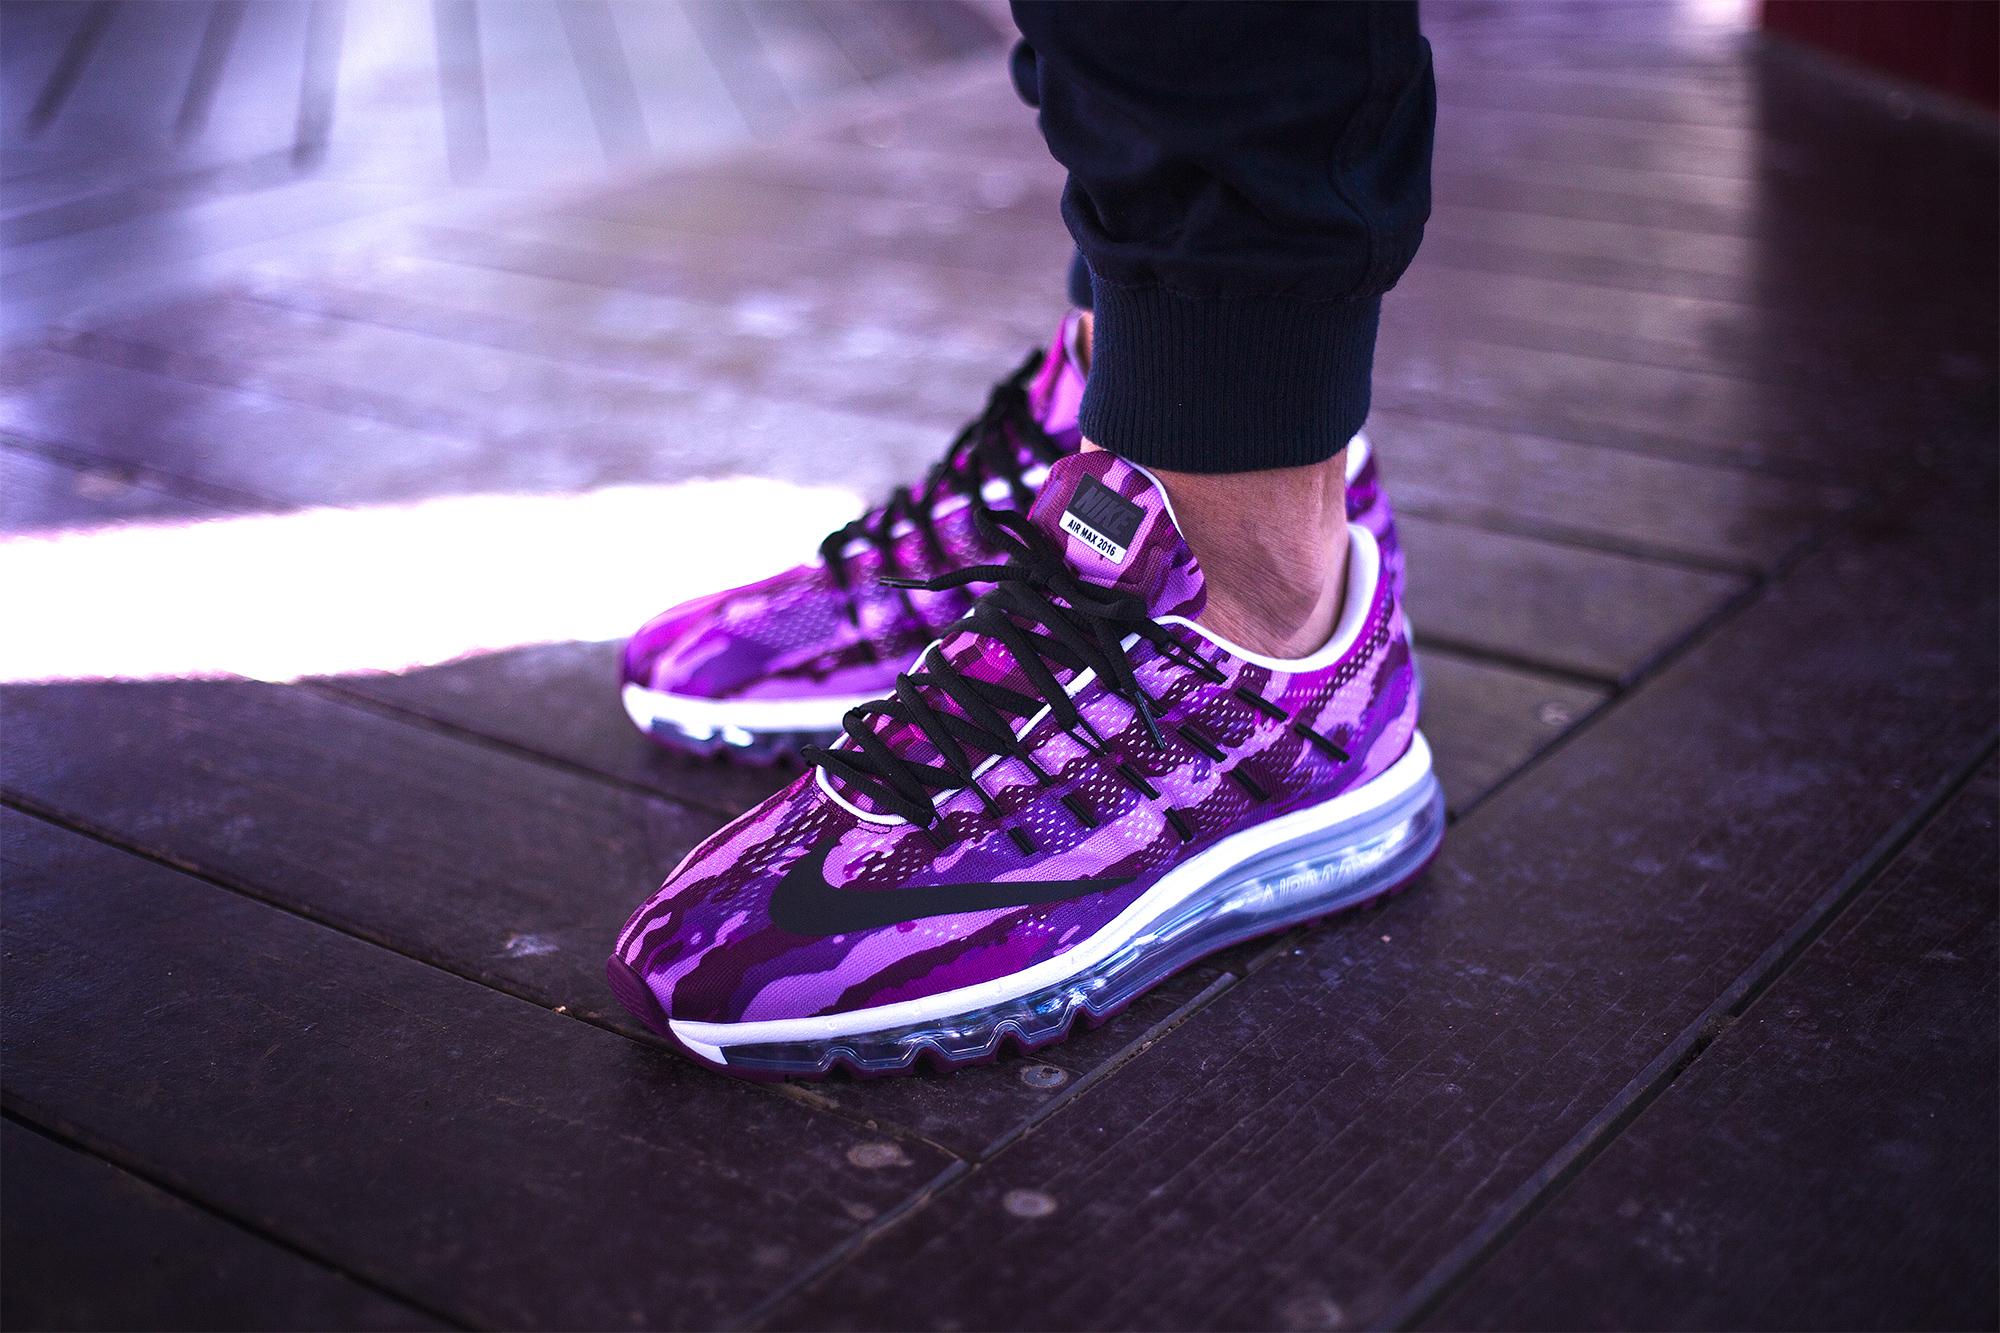 Nike Purple Rain Shoes